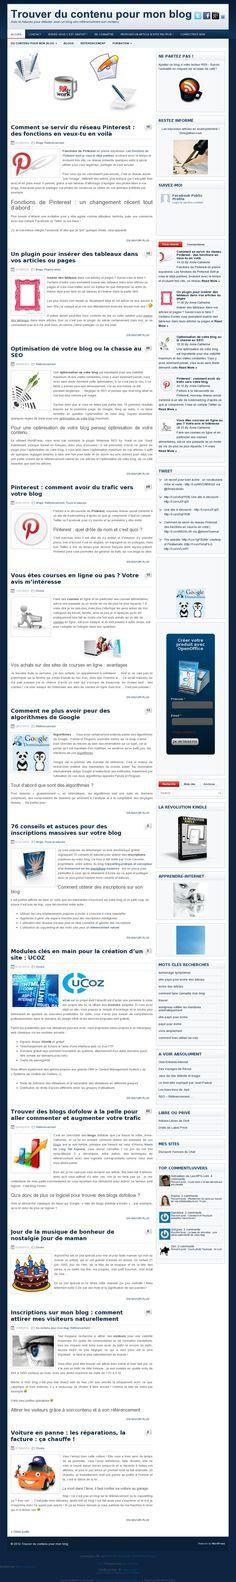 Anne-Catherine vous aide à construire votre blog 'http://cyberentraide.com' courtesy of Pinstamatic (http://pinstamatic.com)